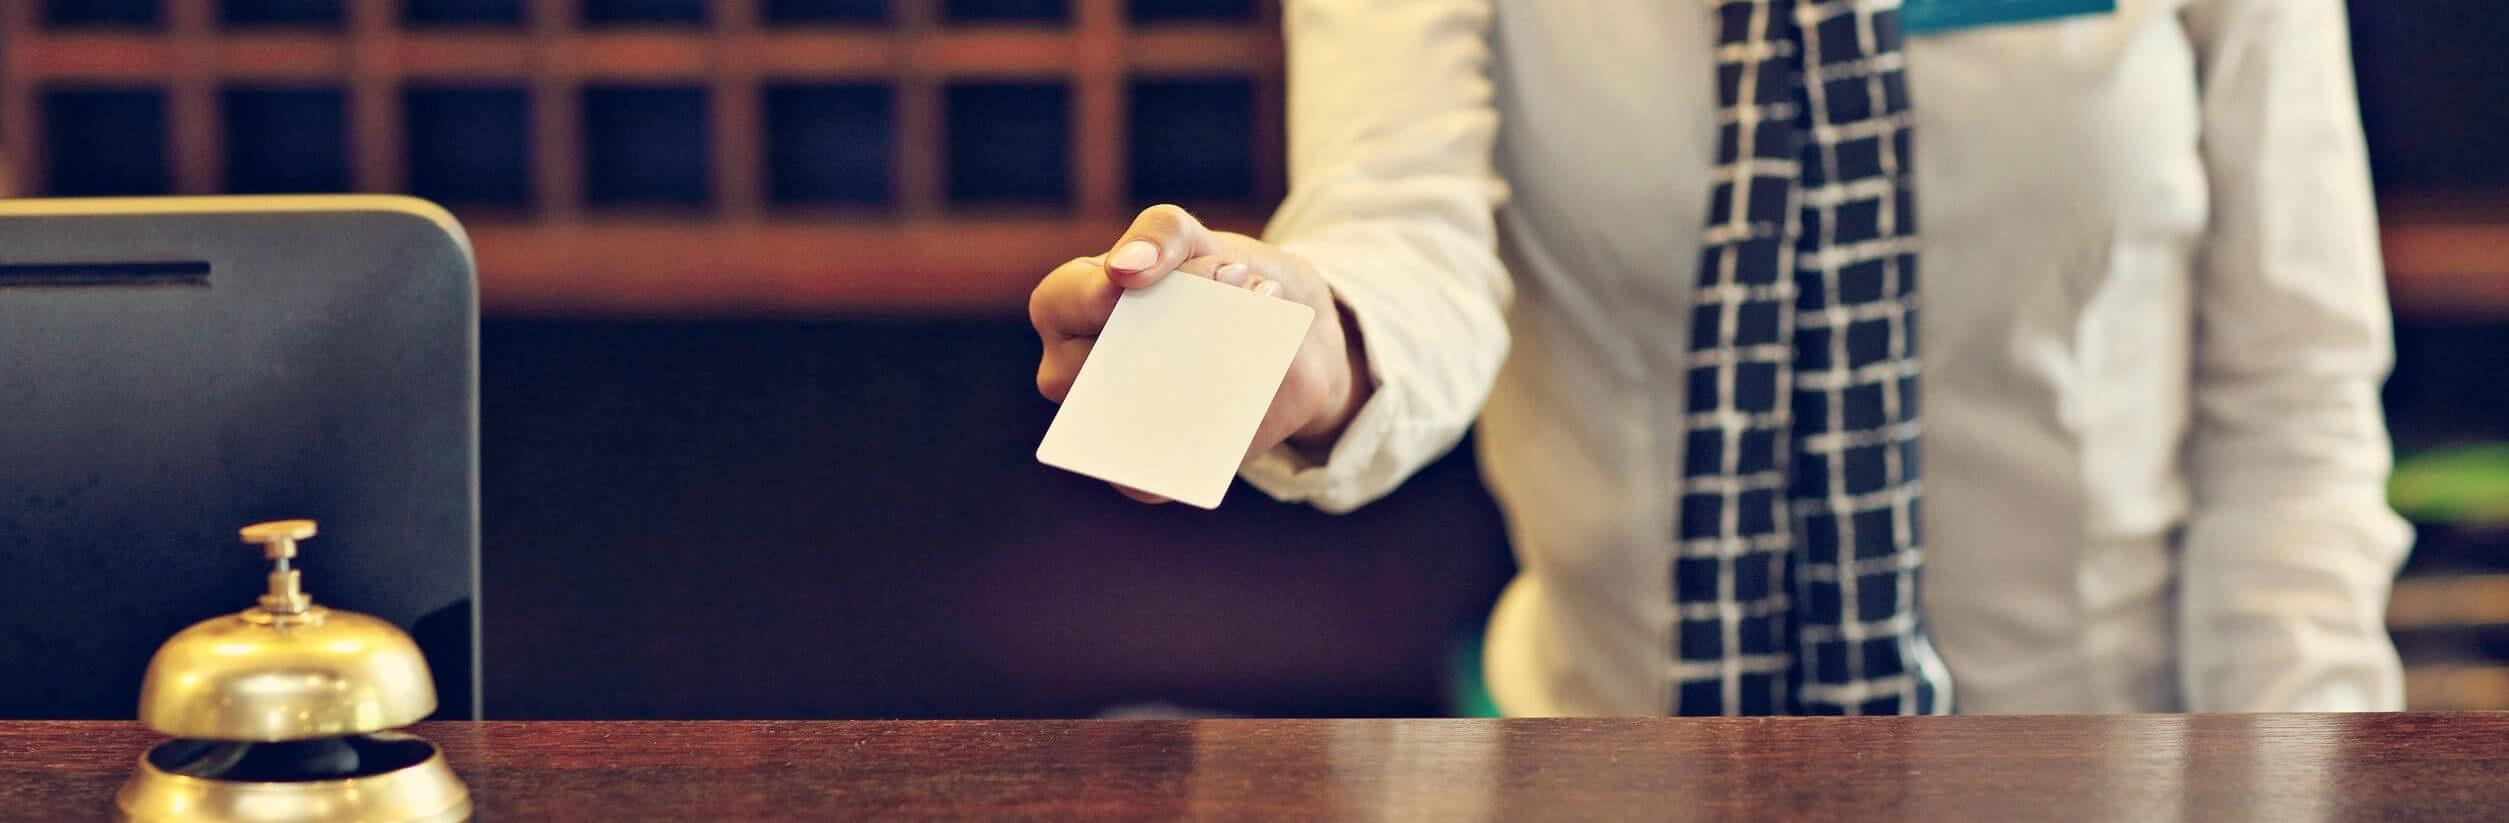 Hotelska kartica_kontrola pristupa_pametna kartica_Andivi_2